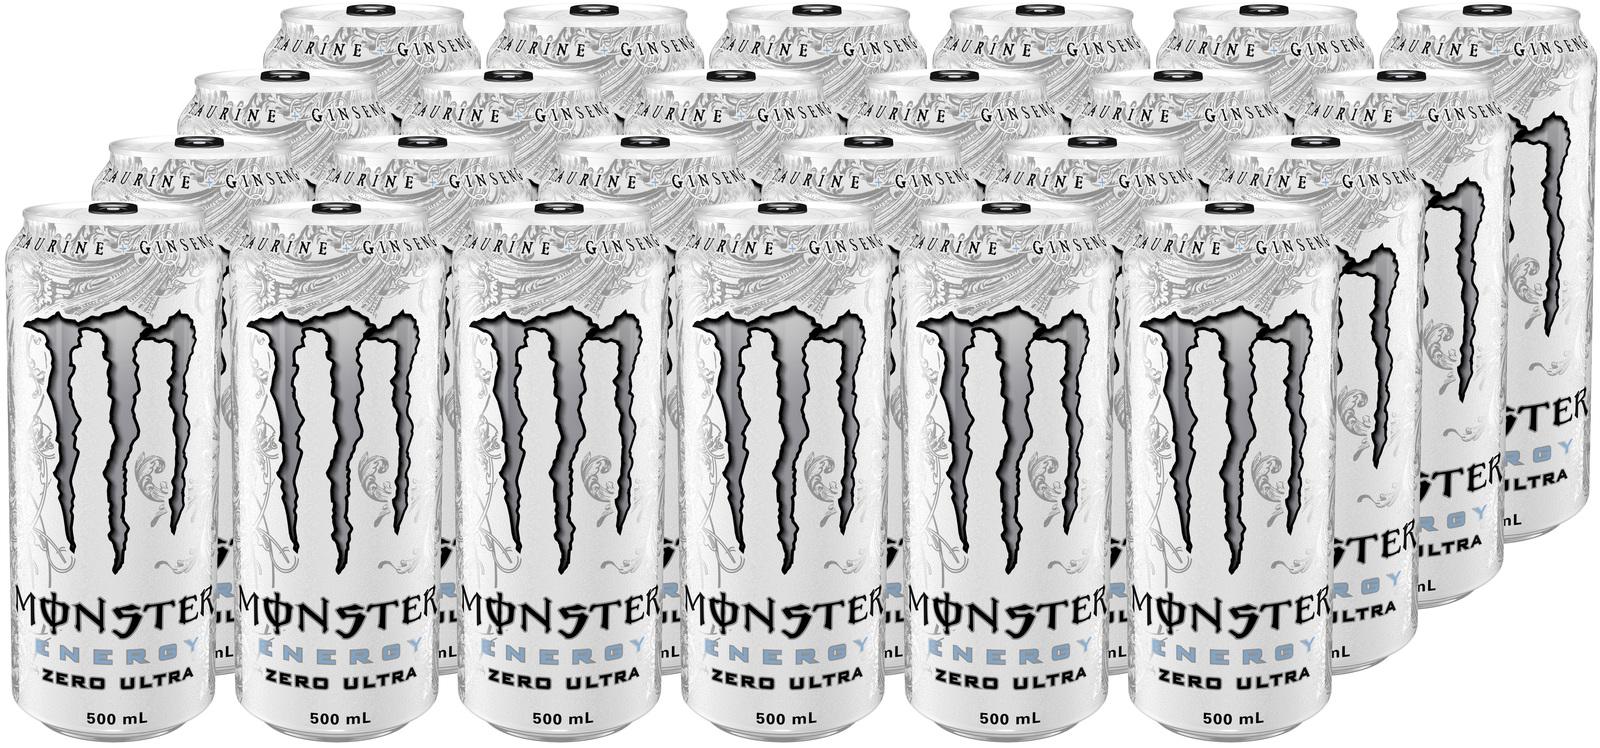 Monster Energy Zero Ultra Energy Drink 500ml Can (24 Pack) image